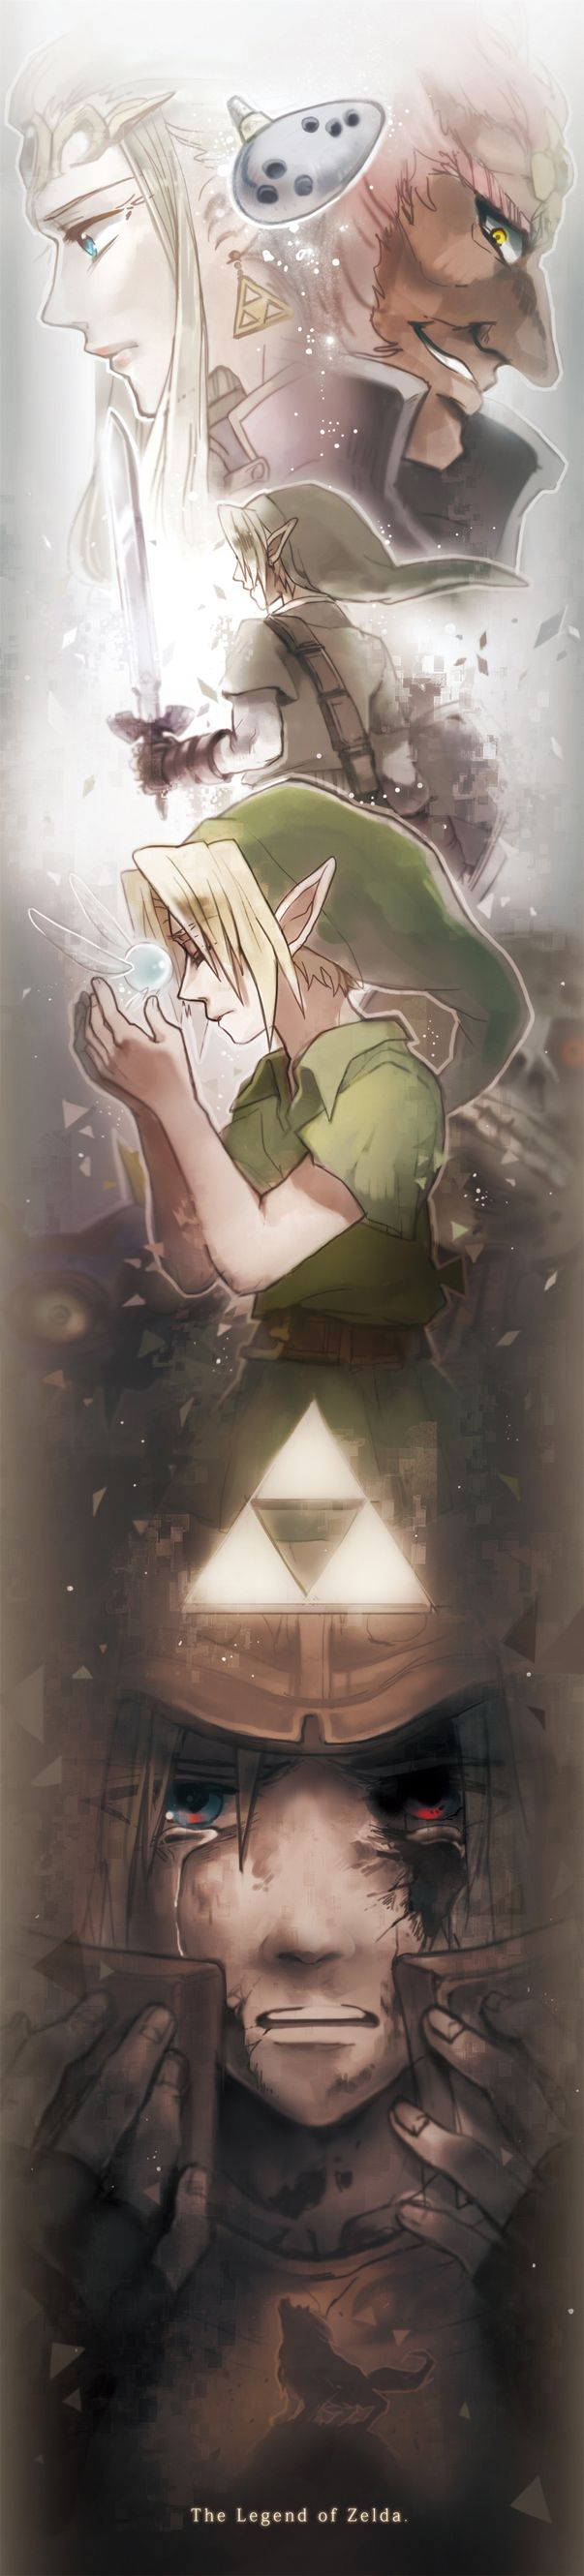 The Legend of Zelda: Twilight Princess/Ocarina of Time